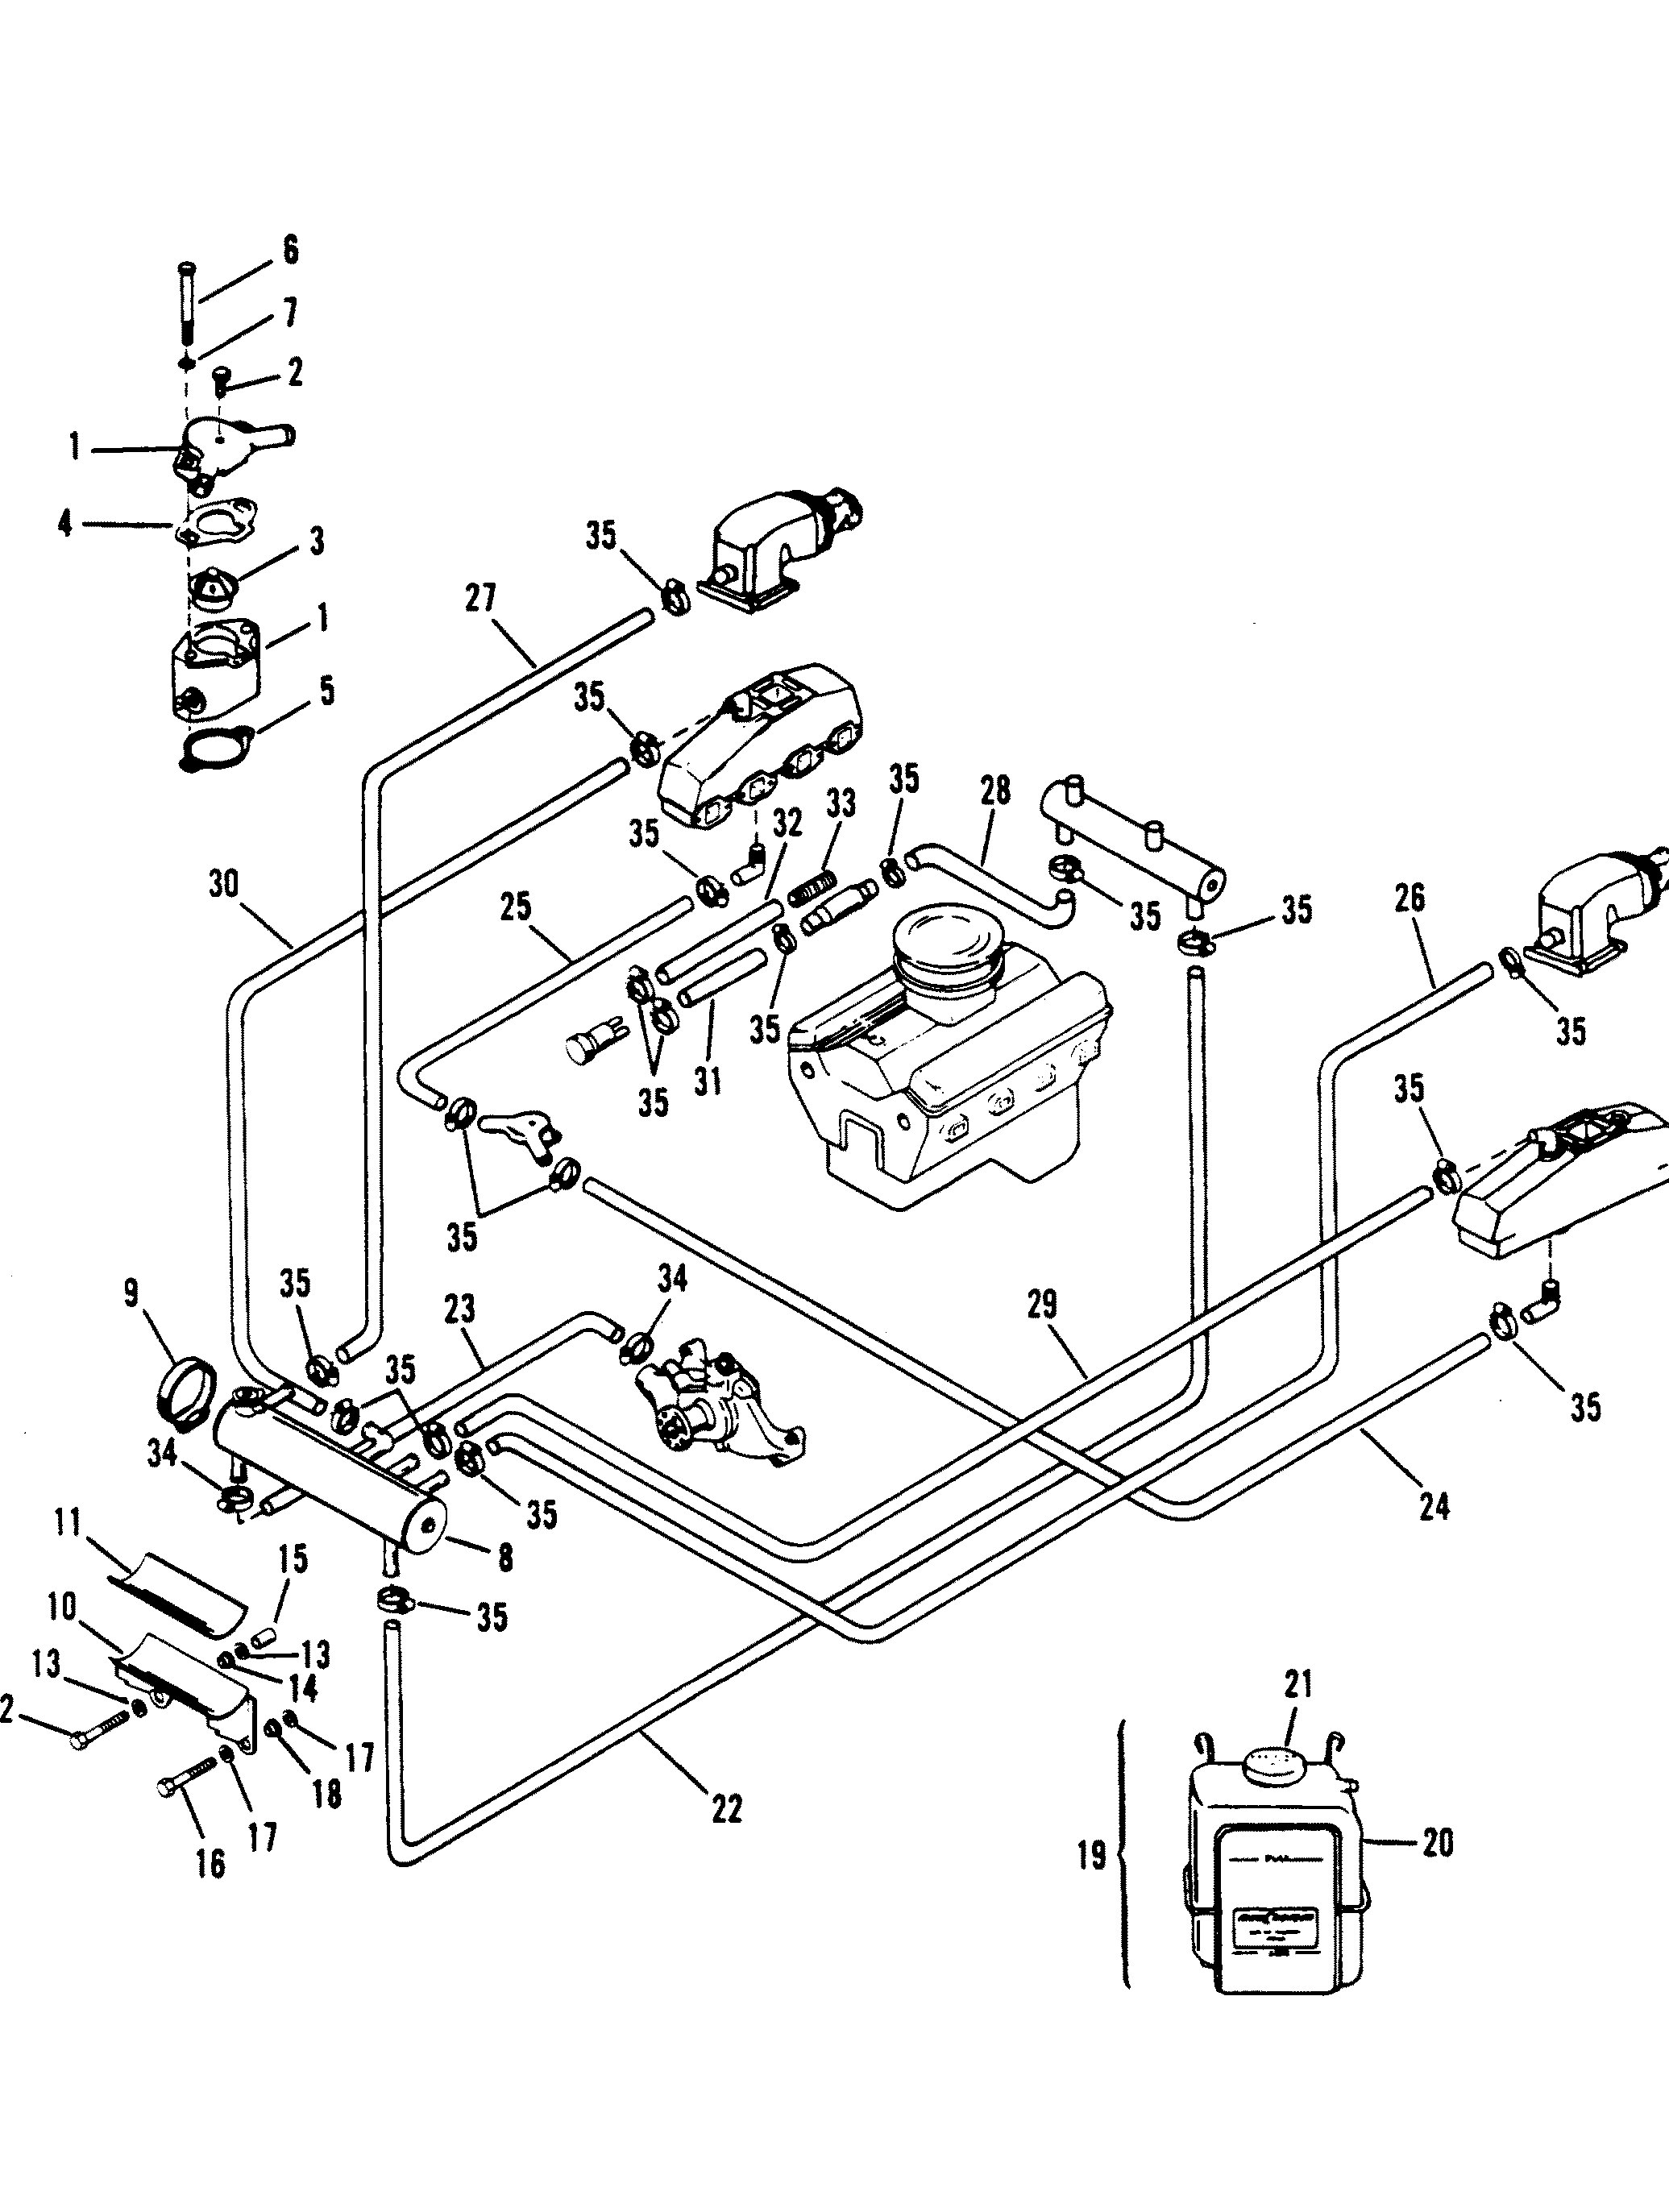 Mercruiser 82l Mie Gen V Gm 502 8 Renault Engine Cooling Diagram Closed System